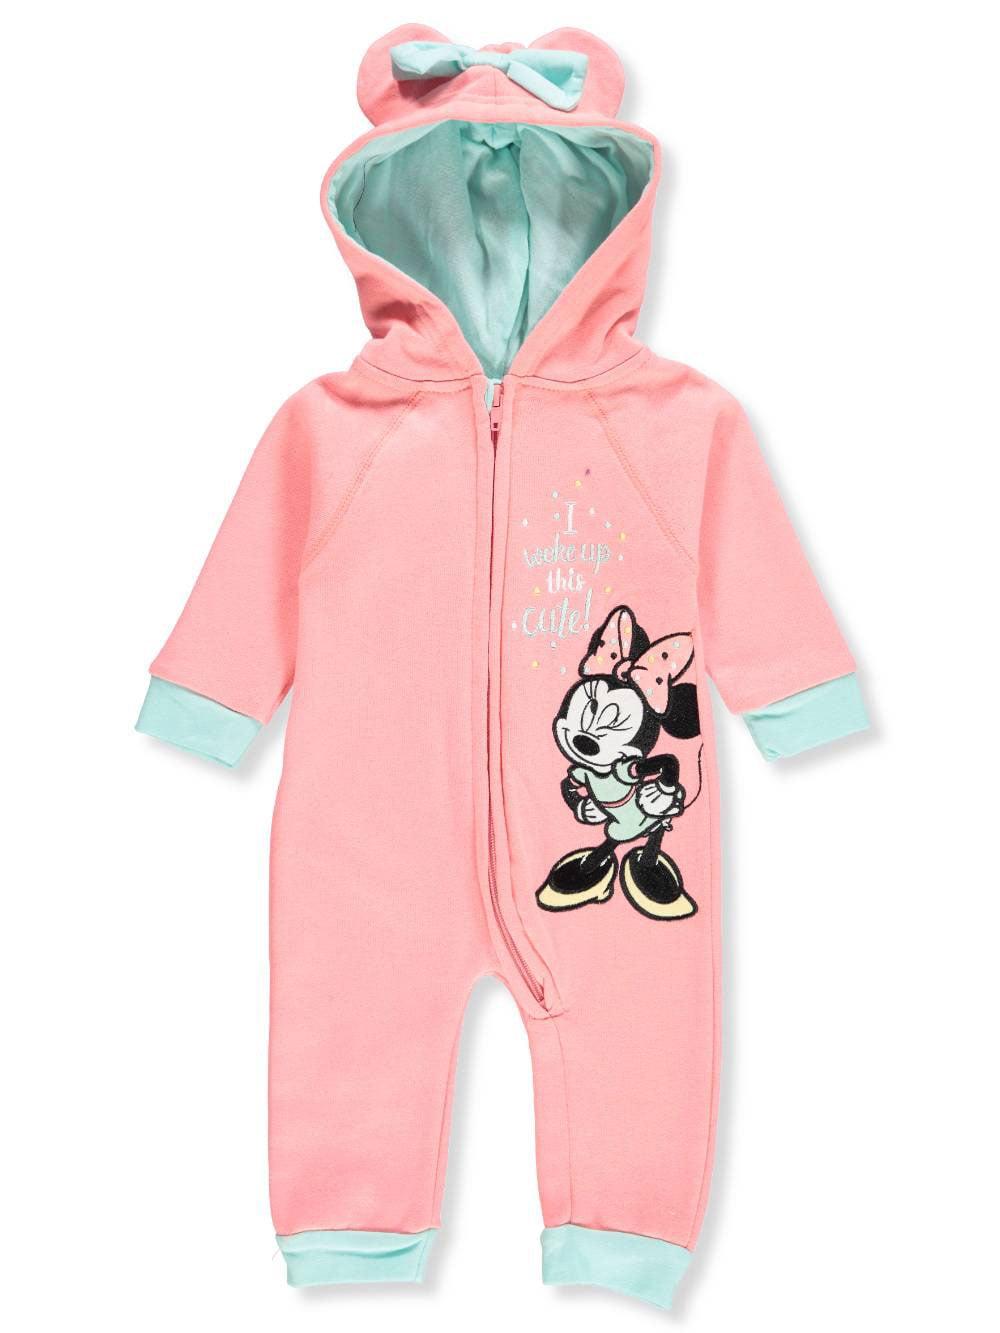 Disney Minnie Mouse Baby Girls' Pram Suit